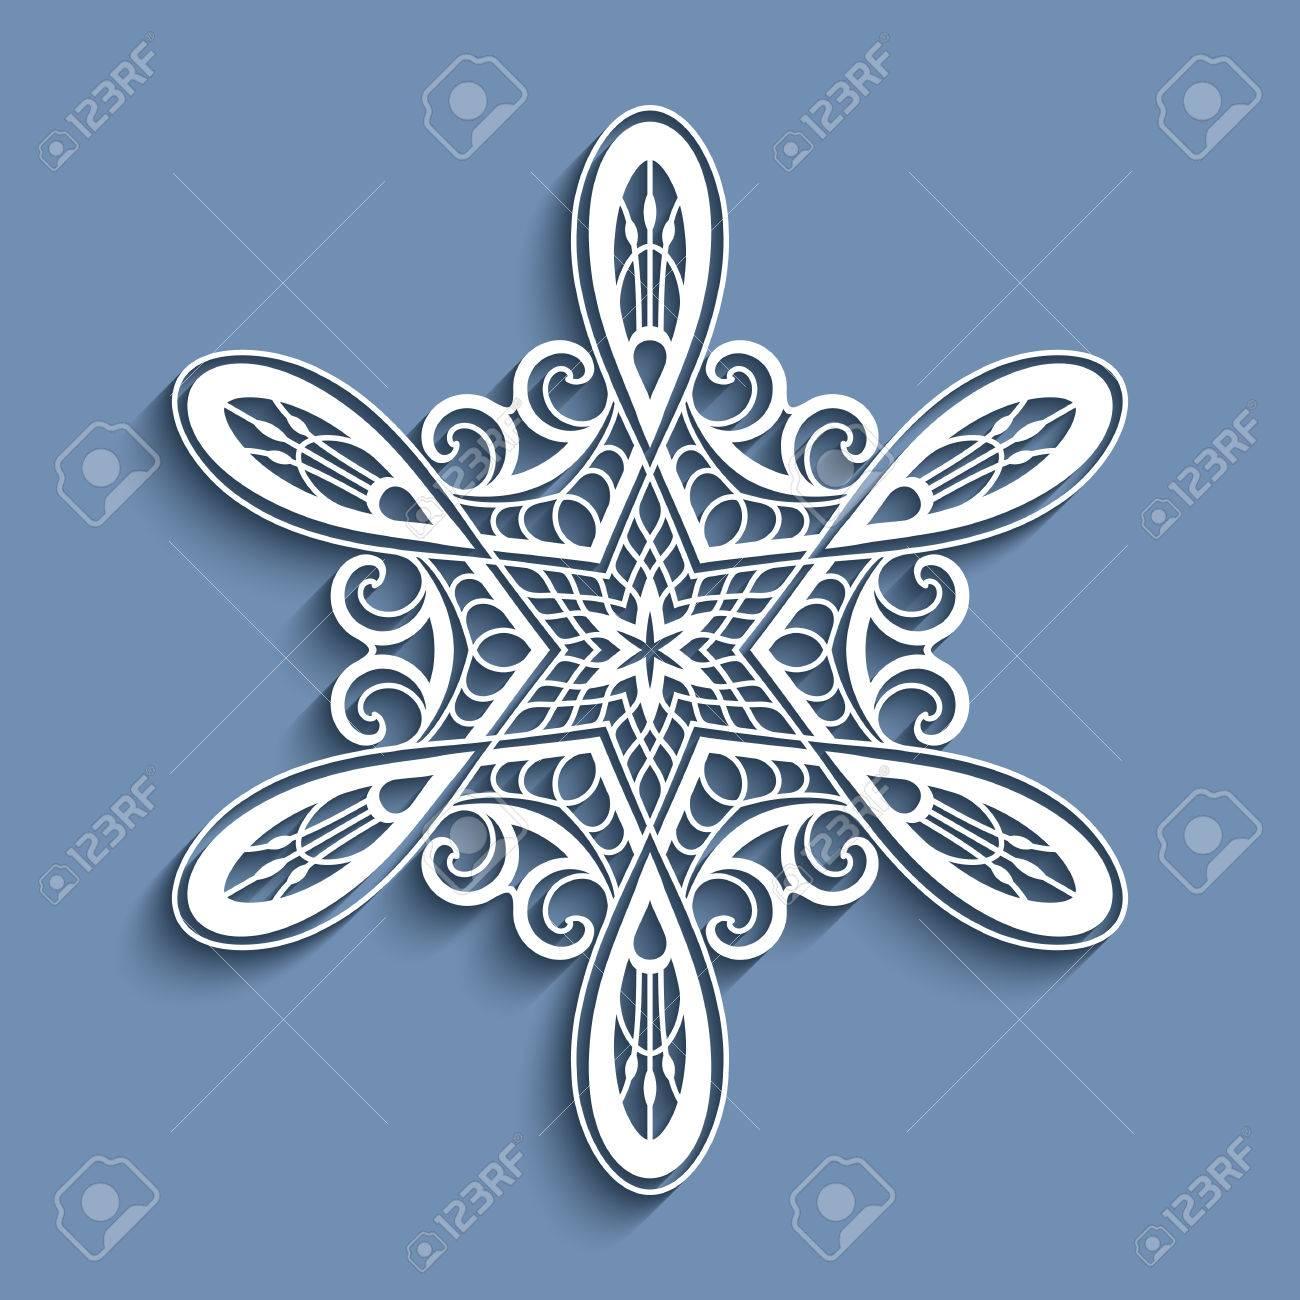 Christmas Cutout Patterns.Cutout Paper Lace Doily Decorative Snowflake Sticker Christmas